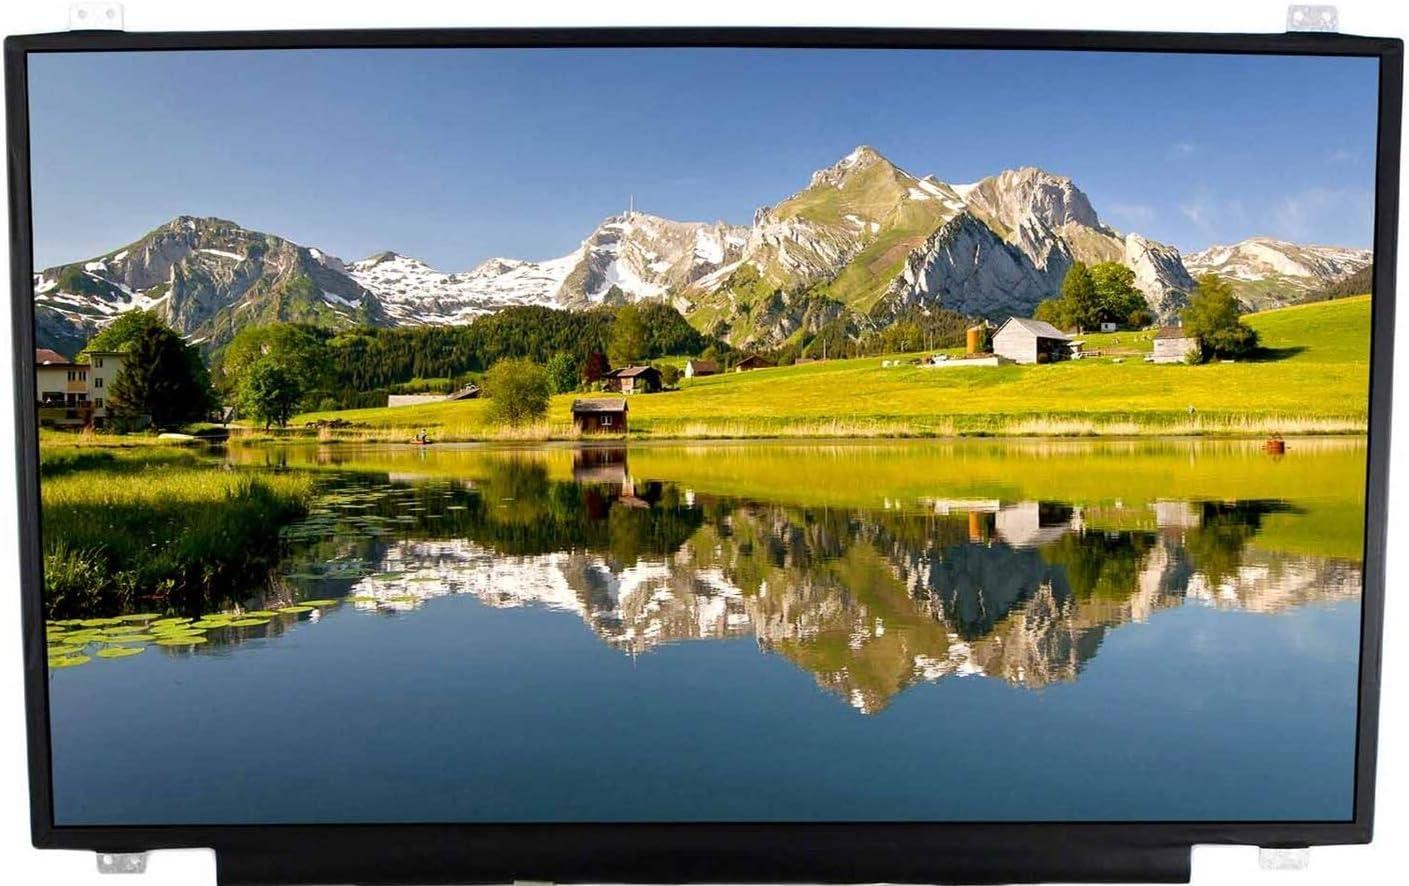 LCD Screen LED Display Panel Only for HP 17-x104nq 17-x118TX 17-x126nf 17-x129nf 17-x130nf 1600x900 JYLTK New Genuine 17.3 HD+